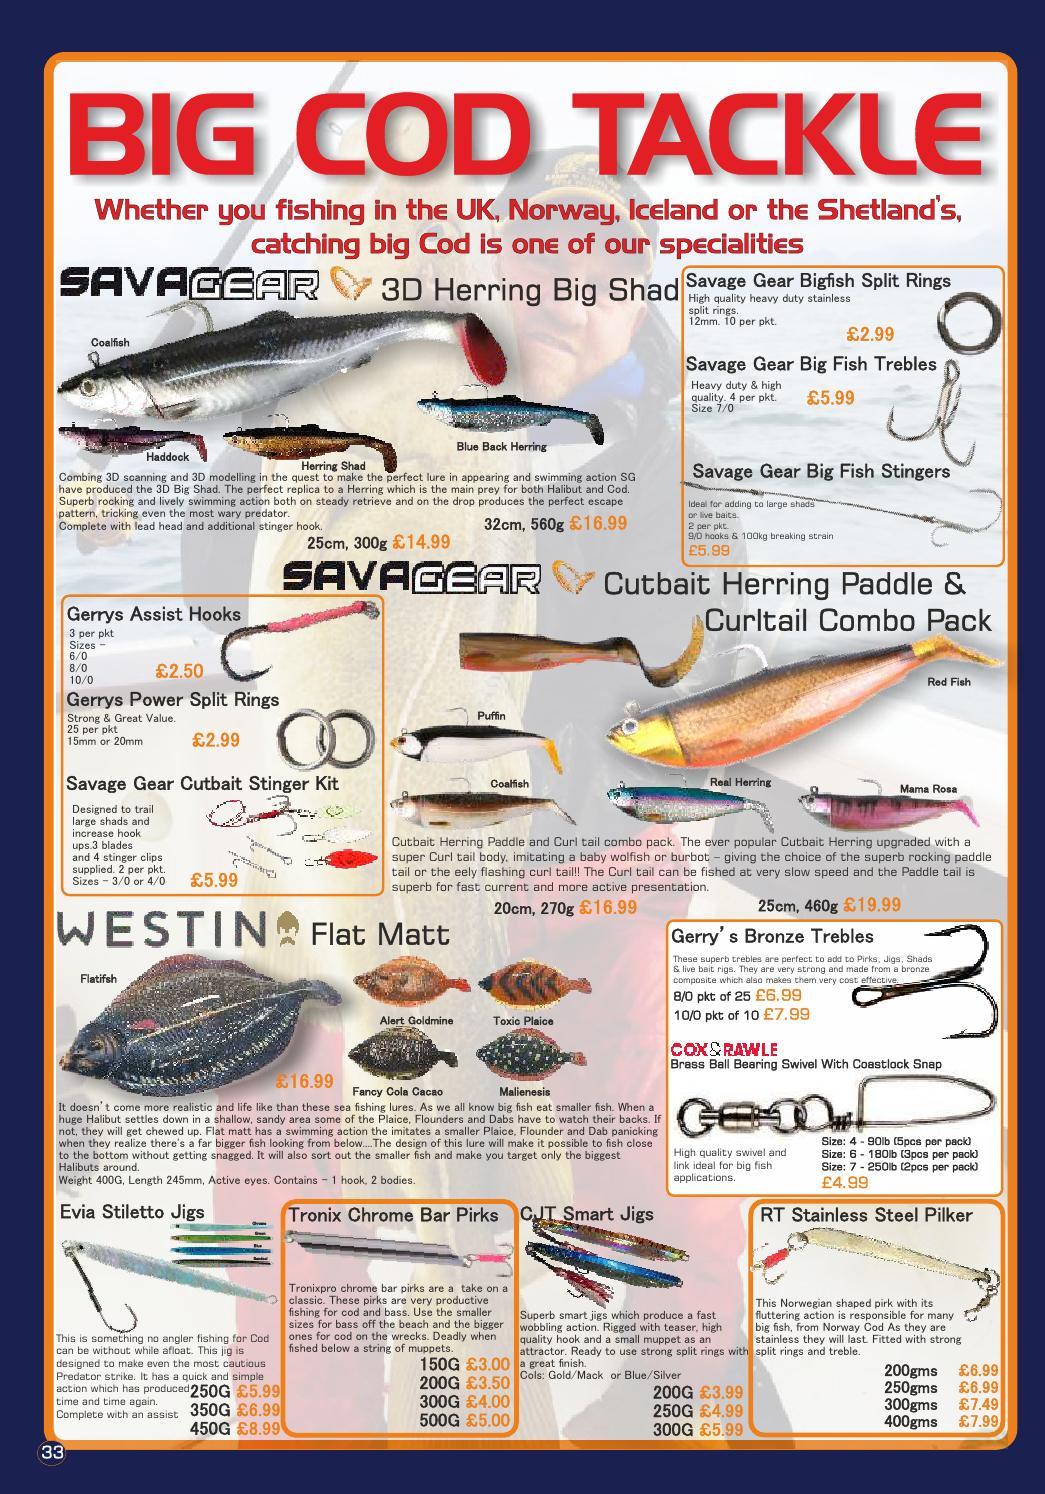 Westin Flat Matt 400g 245mm**Halibut Cod Seafishing Lures**